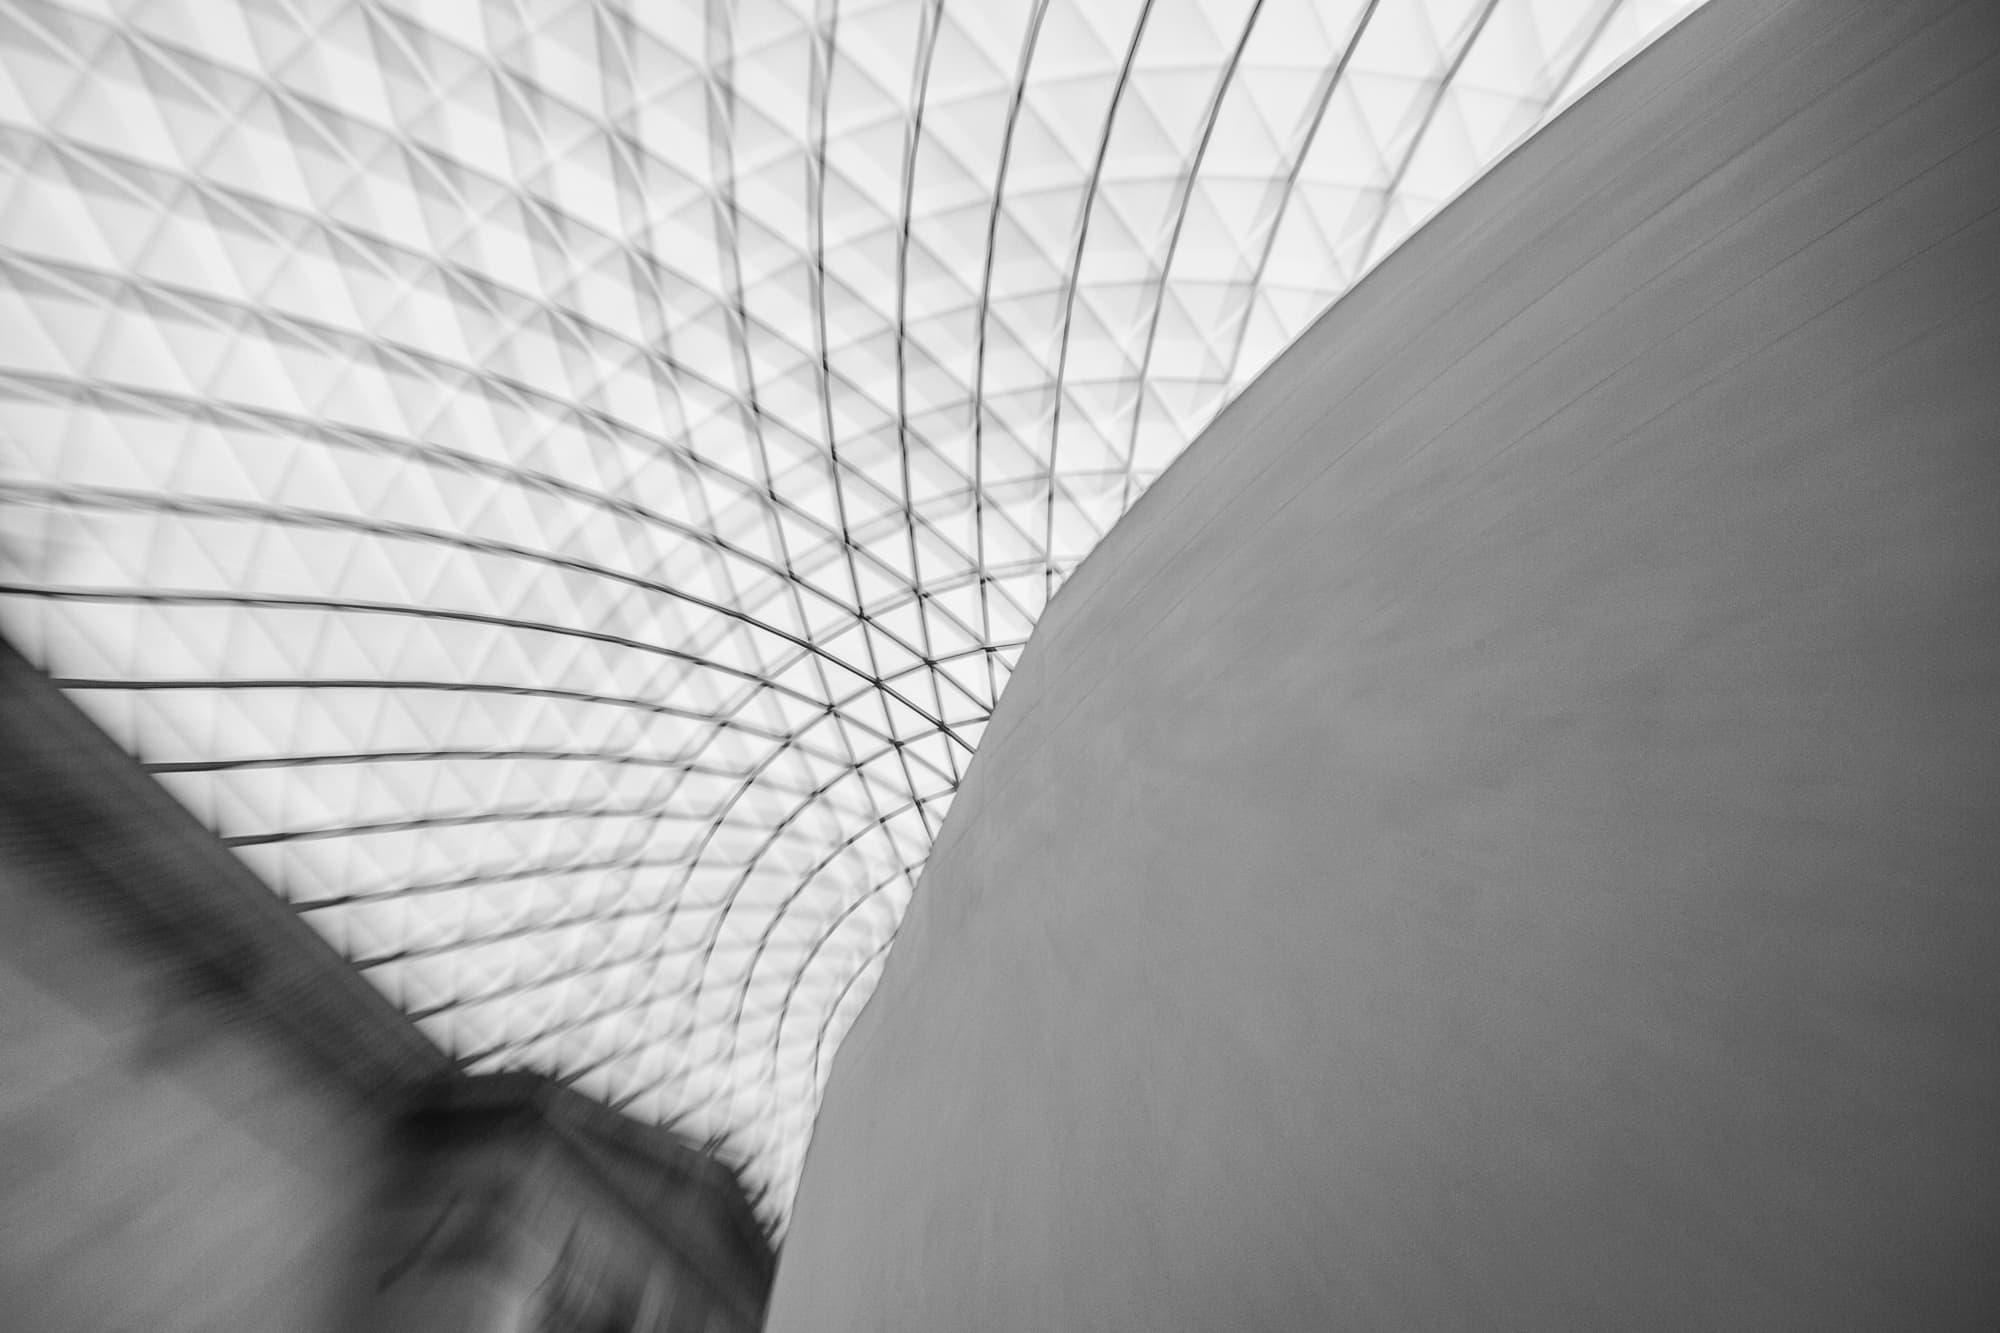 fabio_burrelli_street_photography_architecture_urban_structures_london_P5B3004.jpg